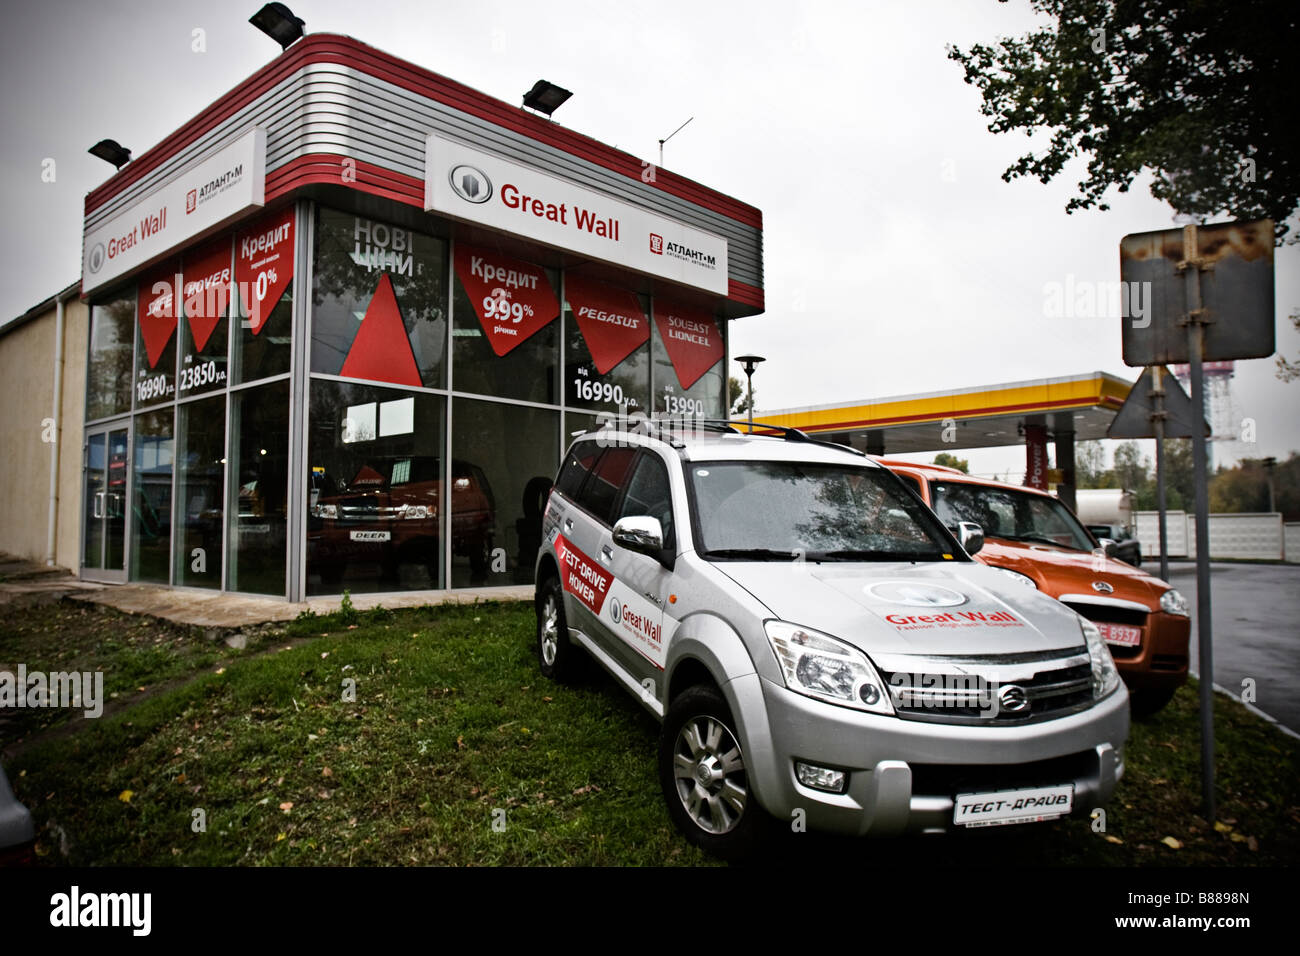 Great Wall Car dealership in Kiev Ukraine Stock Photo